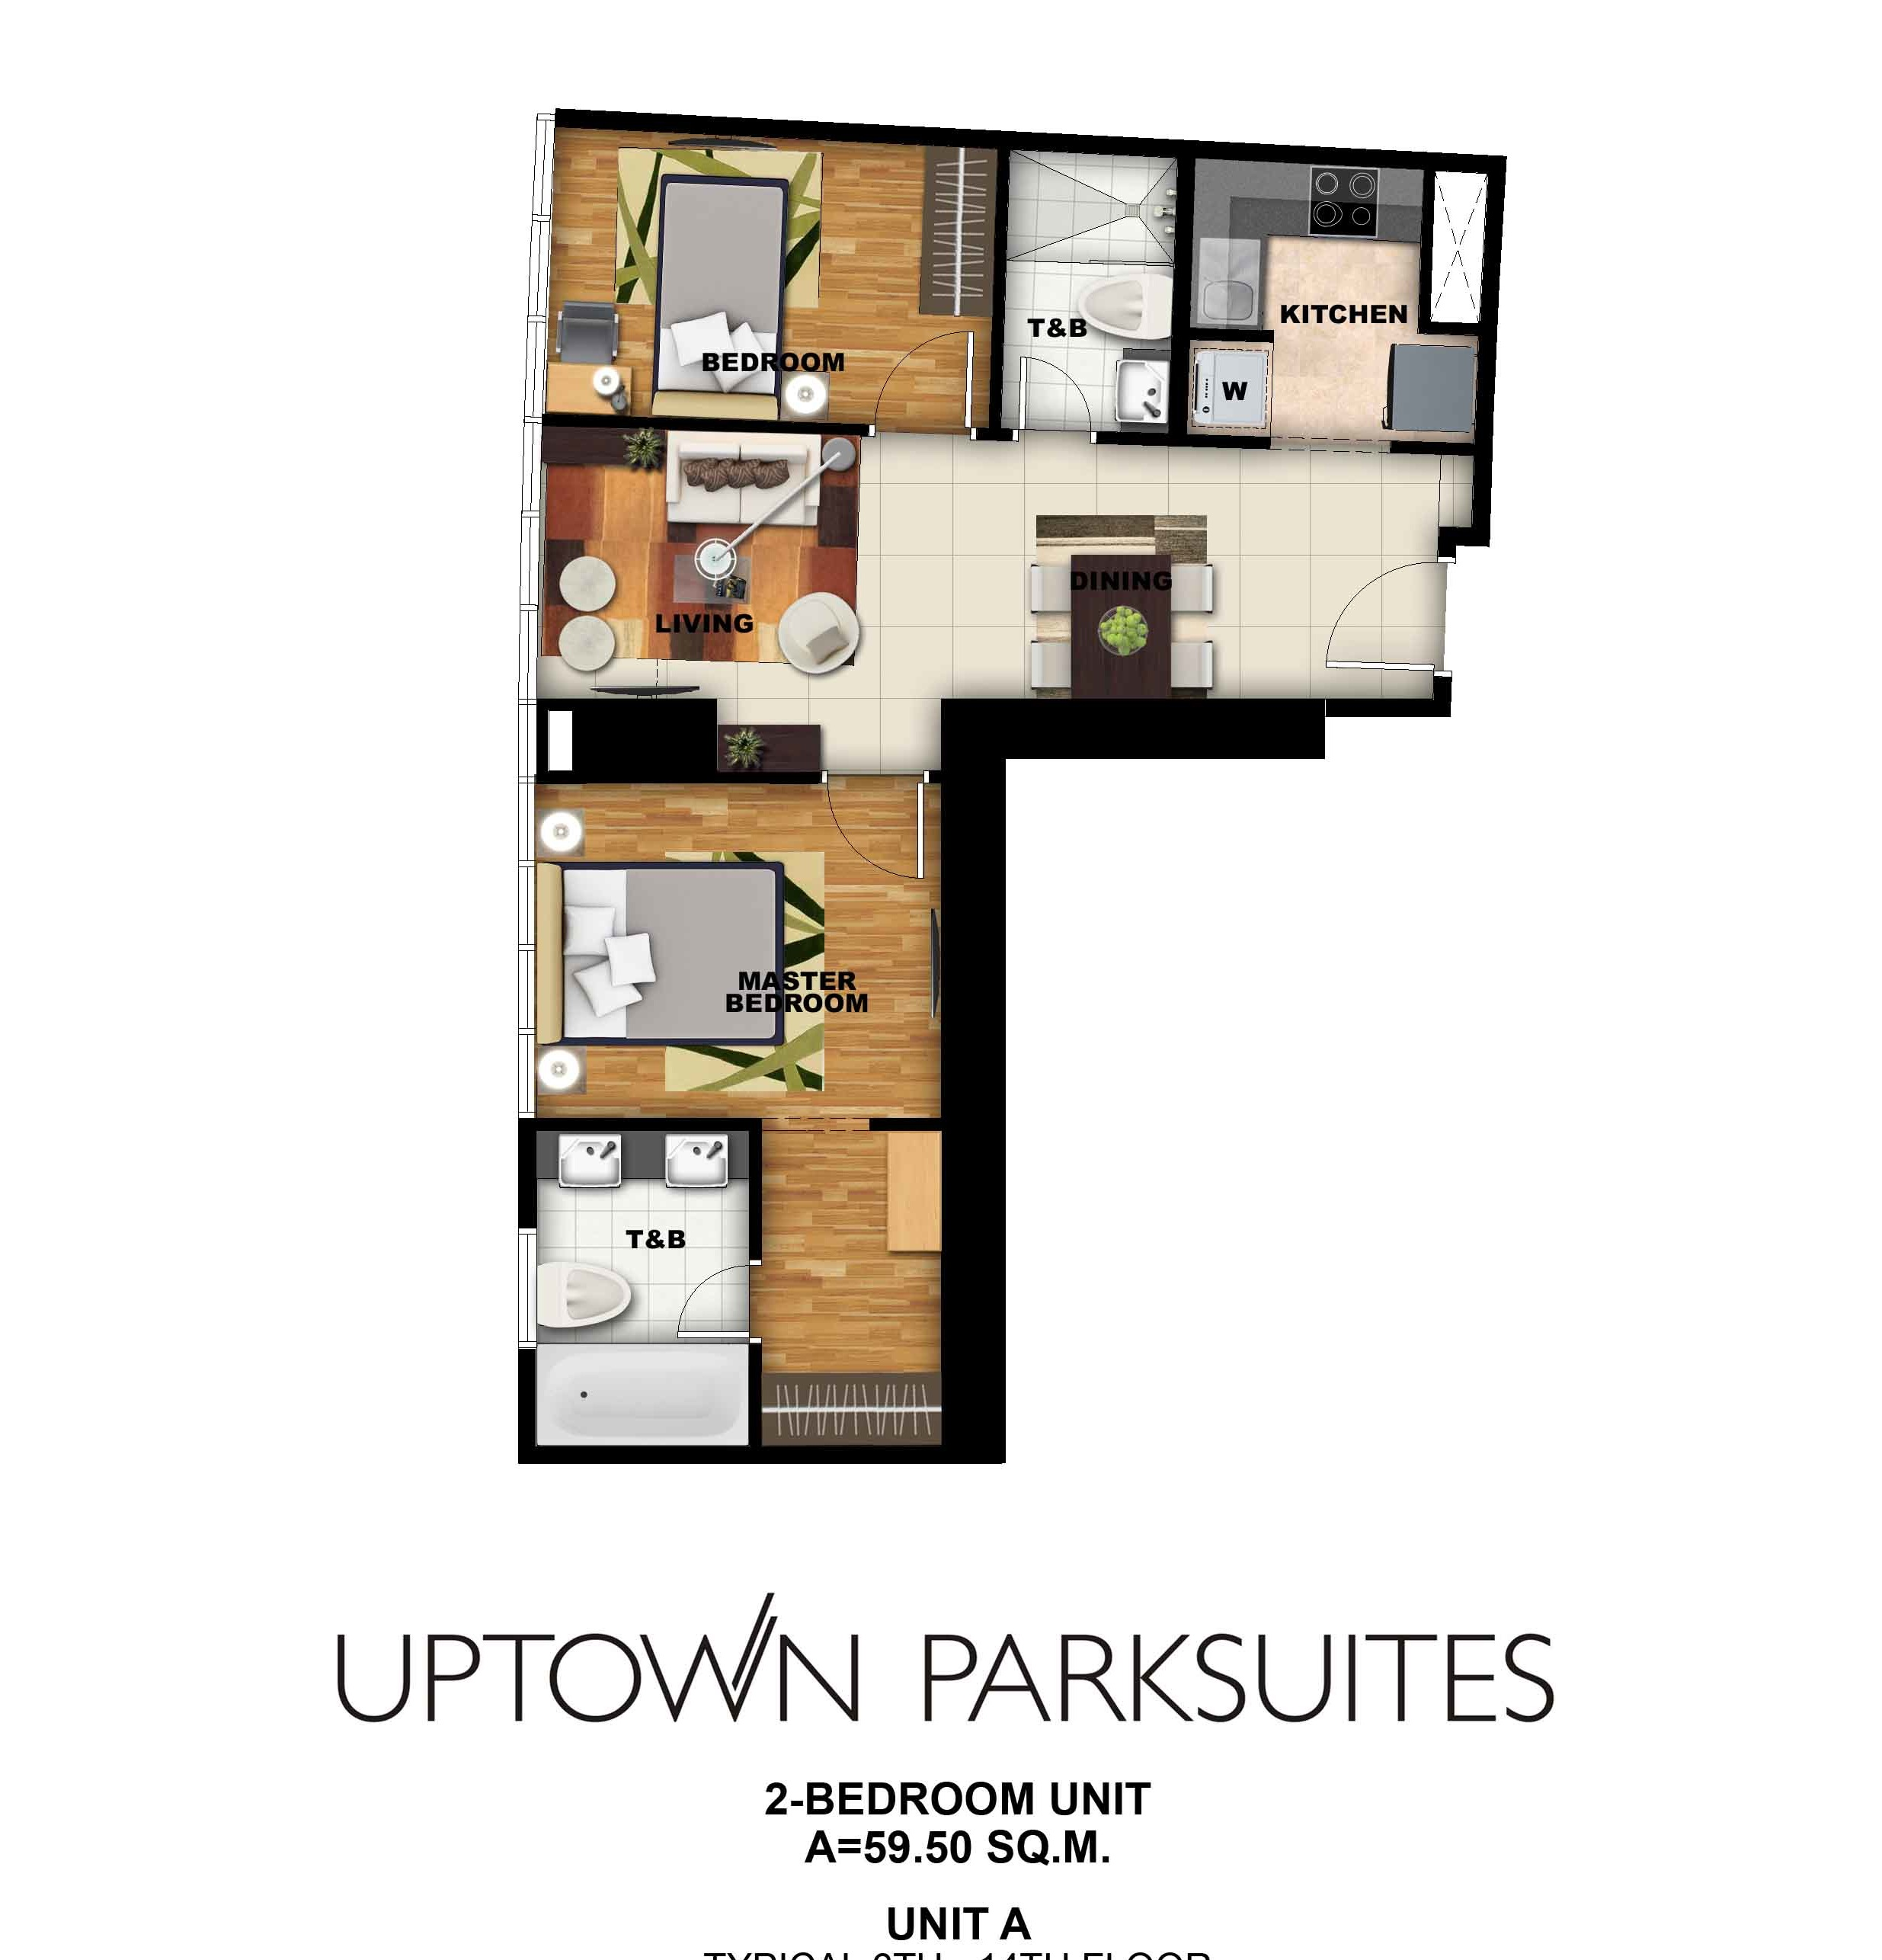 Uptown parksuites 2 bedroom